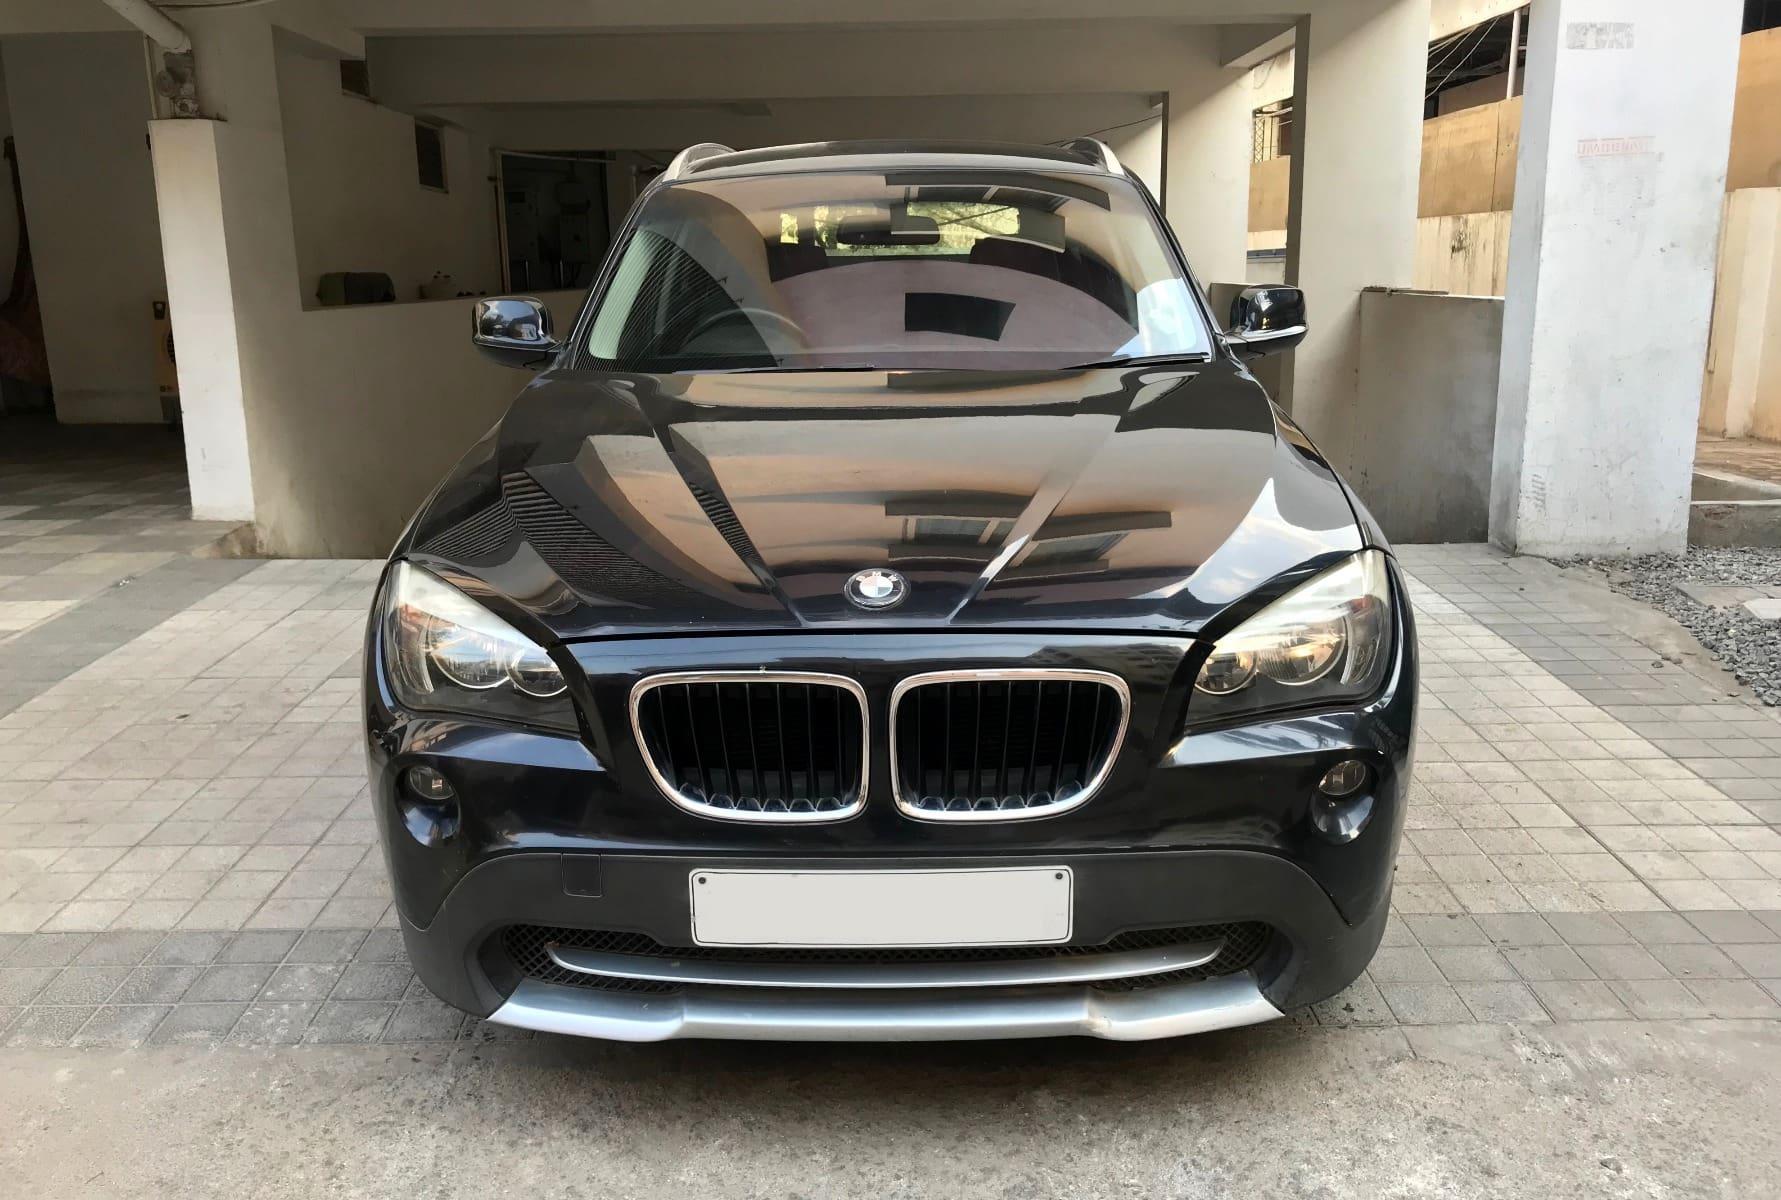 BMW X1 2012-2015 sDrive20d